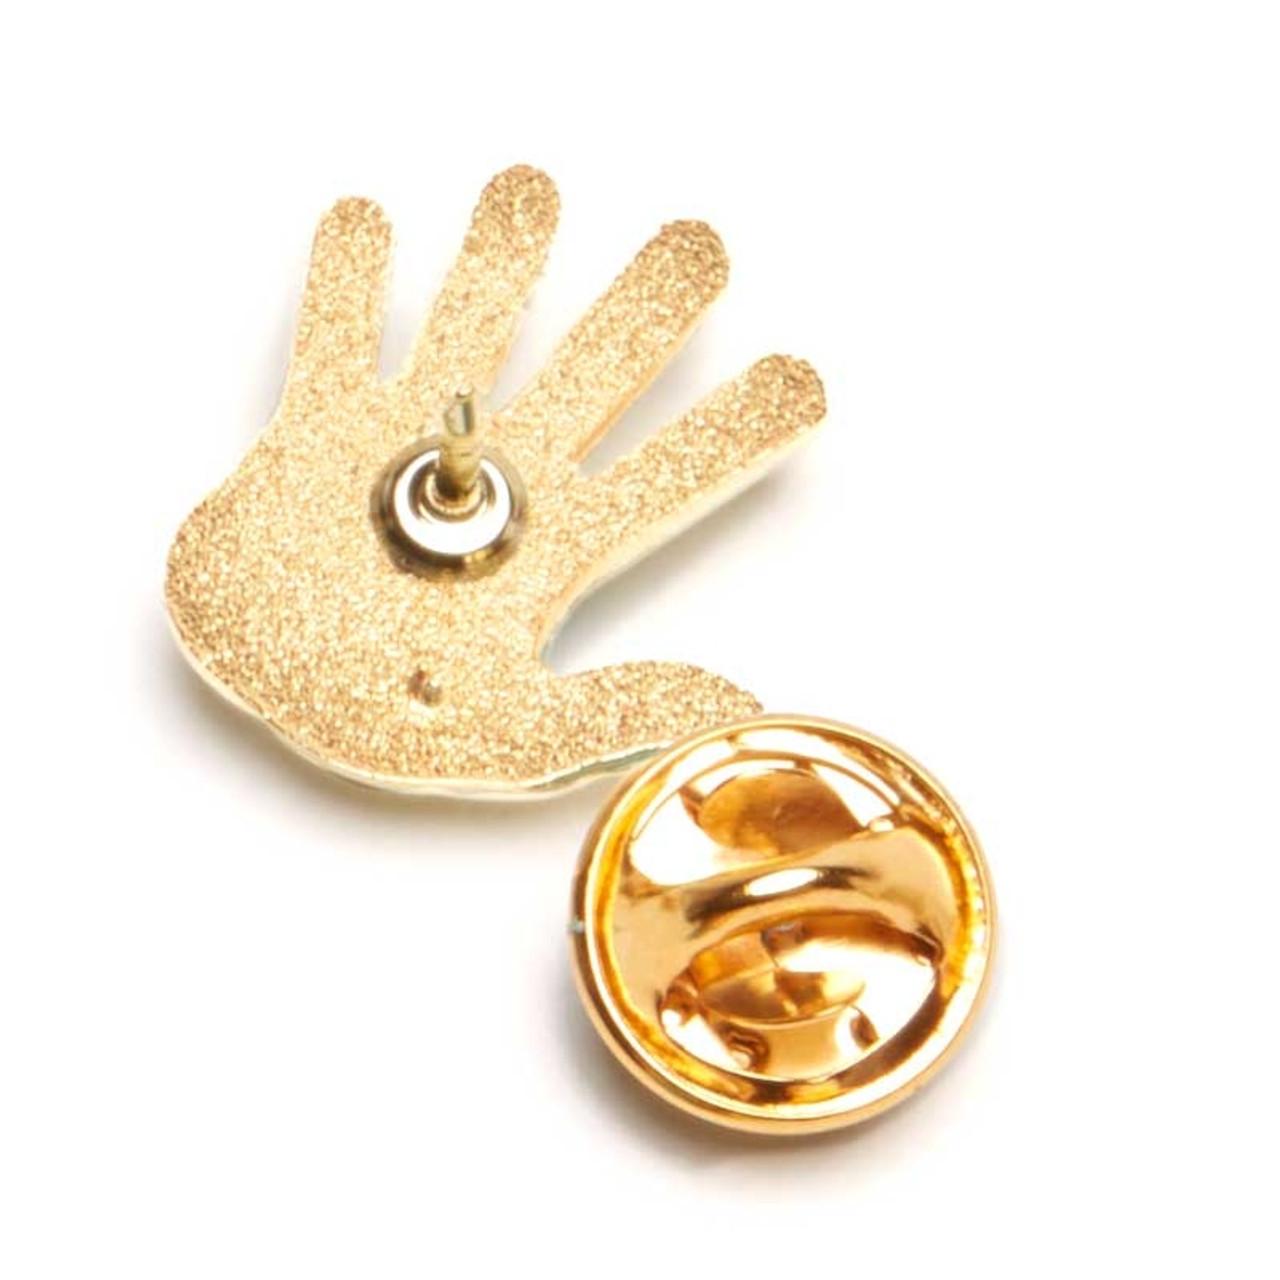 High Five Lapel Pin; back